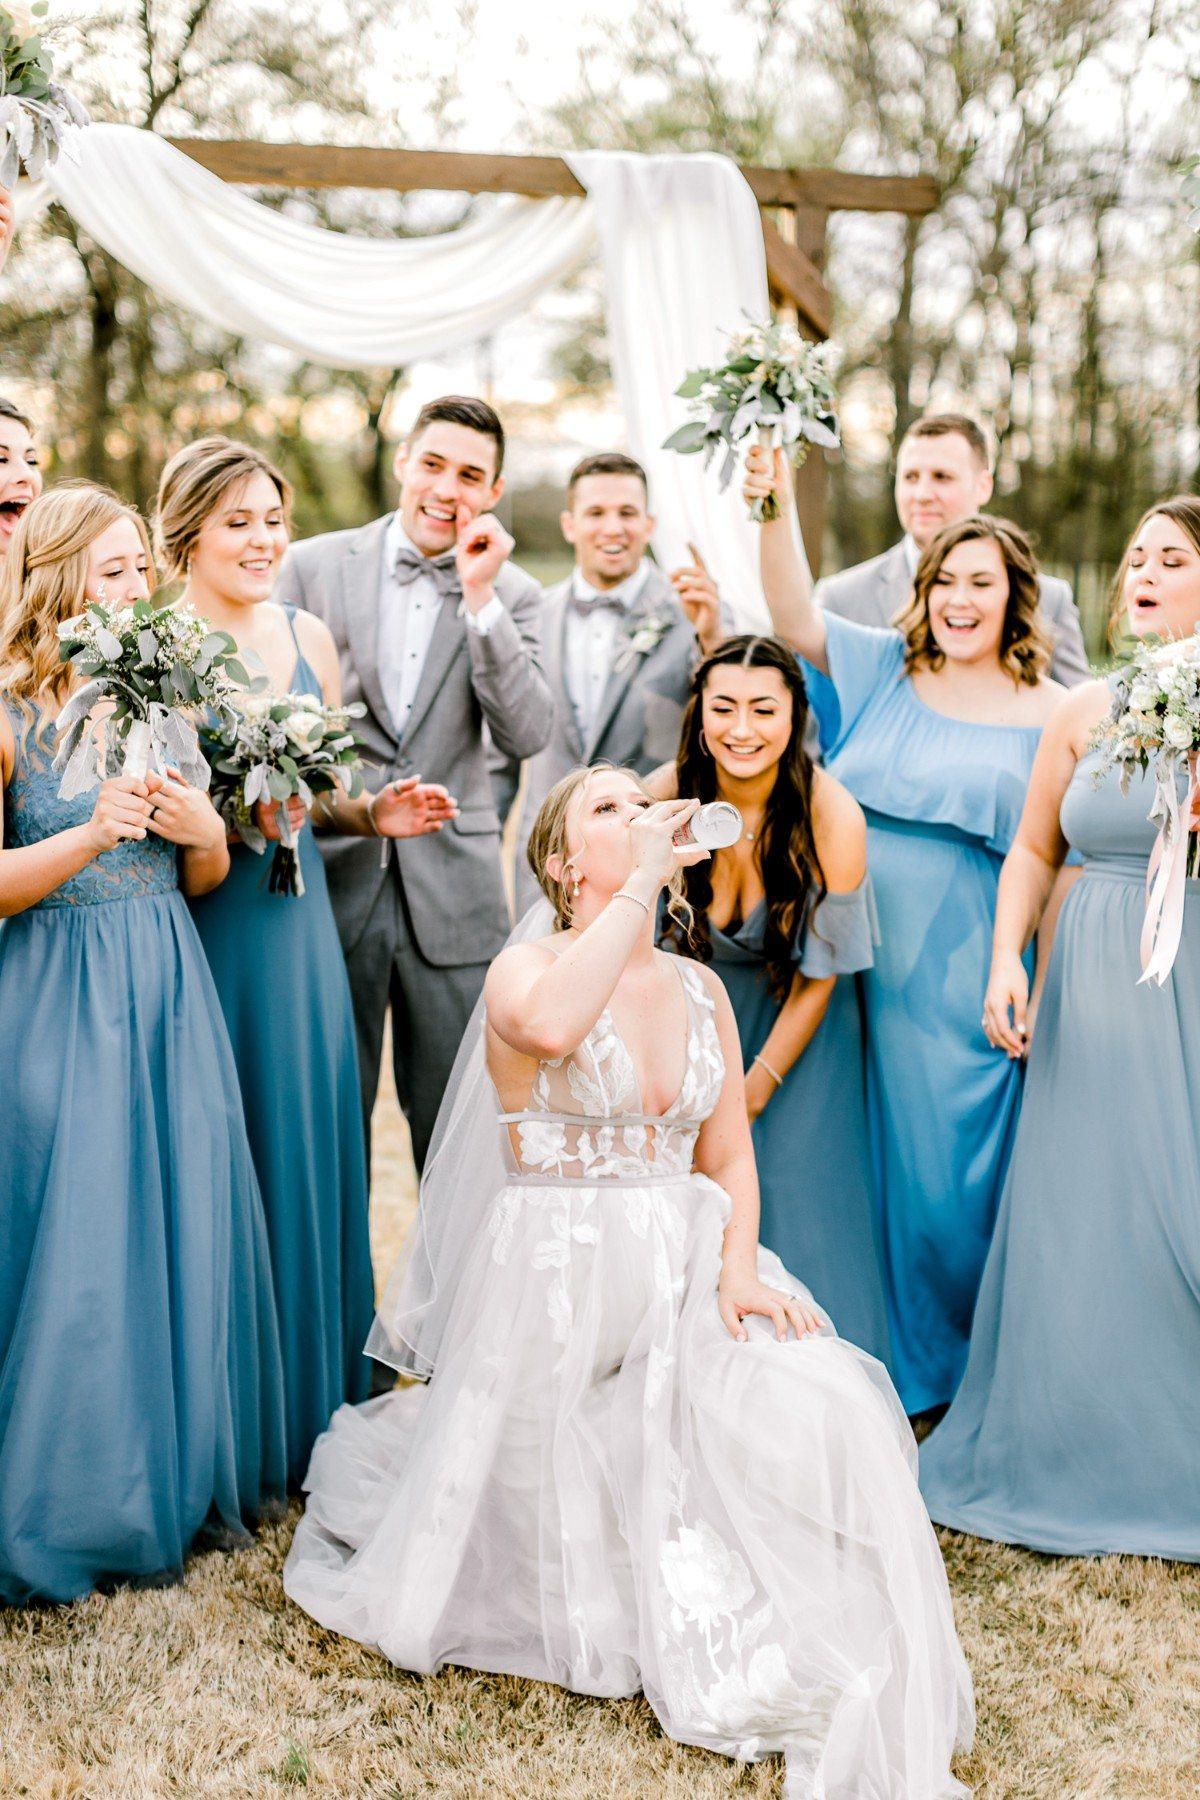 ennis-texas-wedding-photographer-kaitlyn-bullard-98.jpg